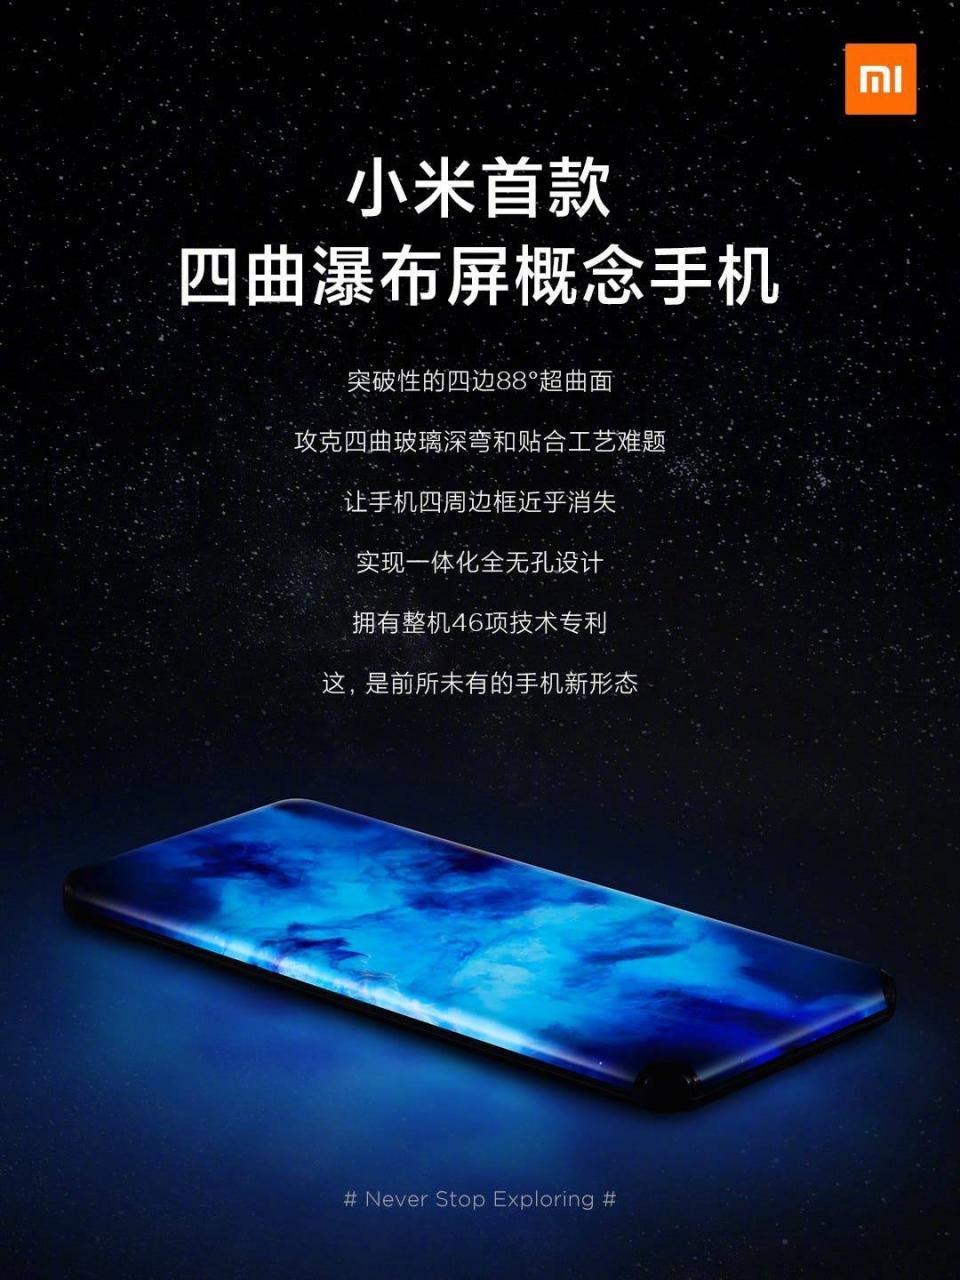 Teléfono Xiaomi Siqu Quad Curved Concept